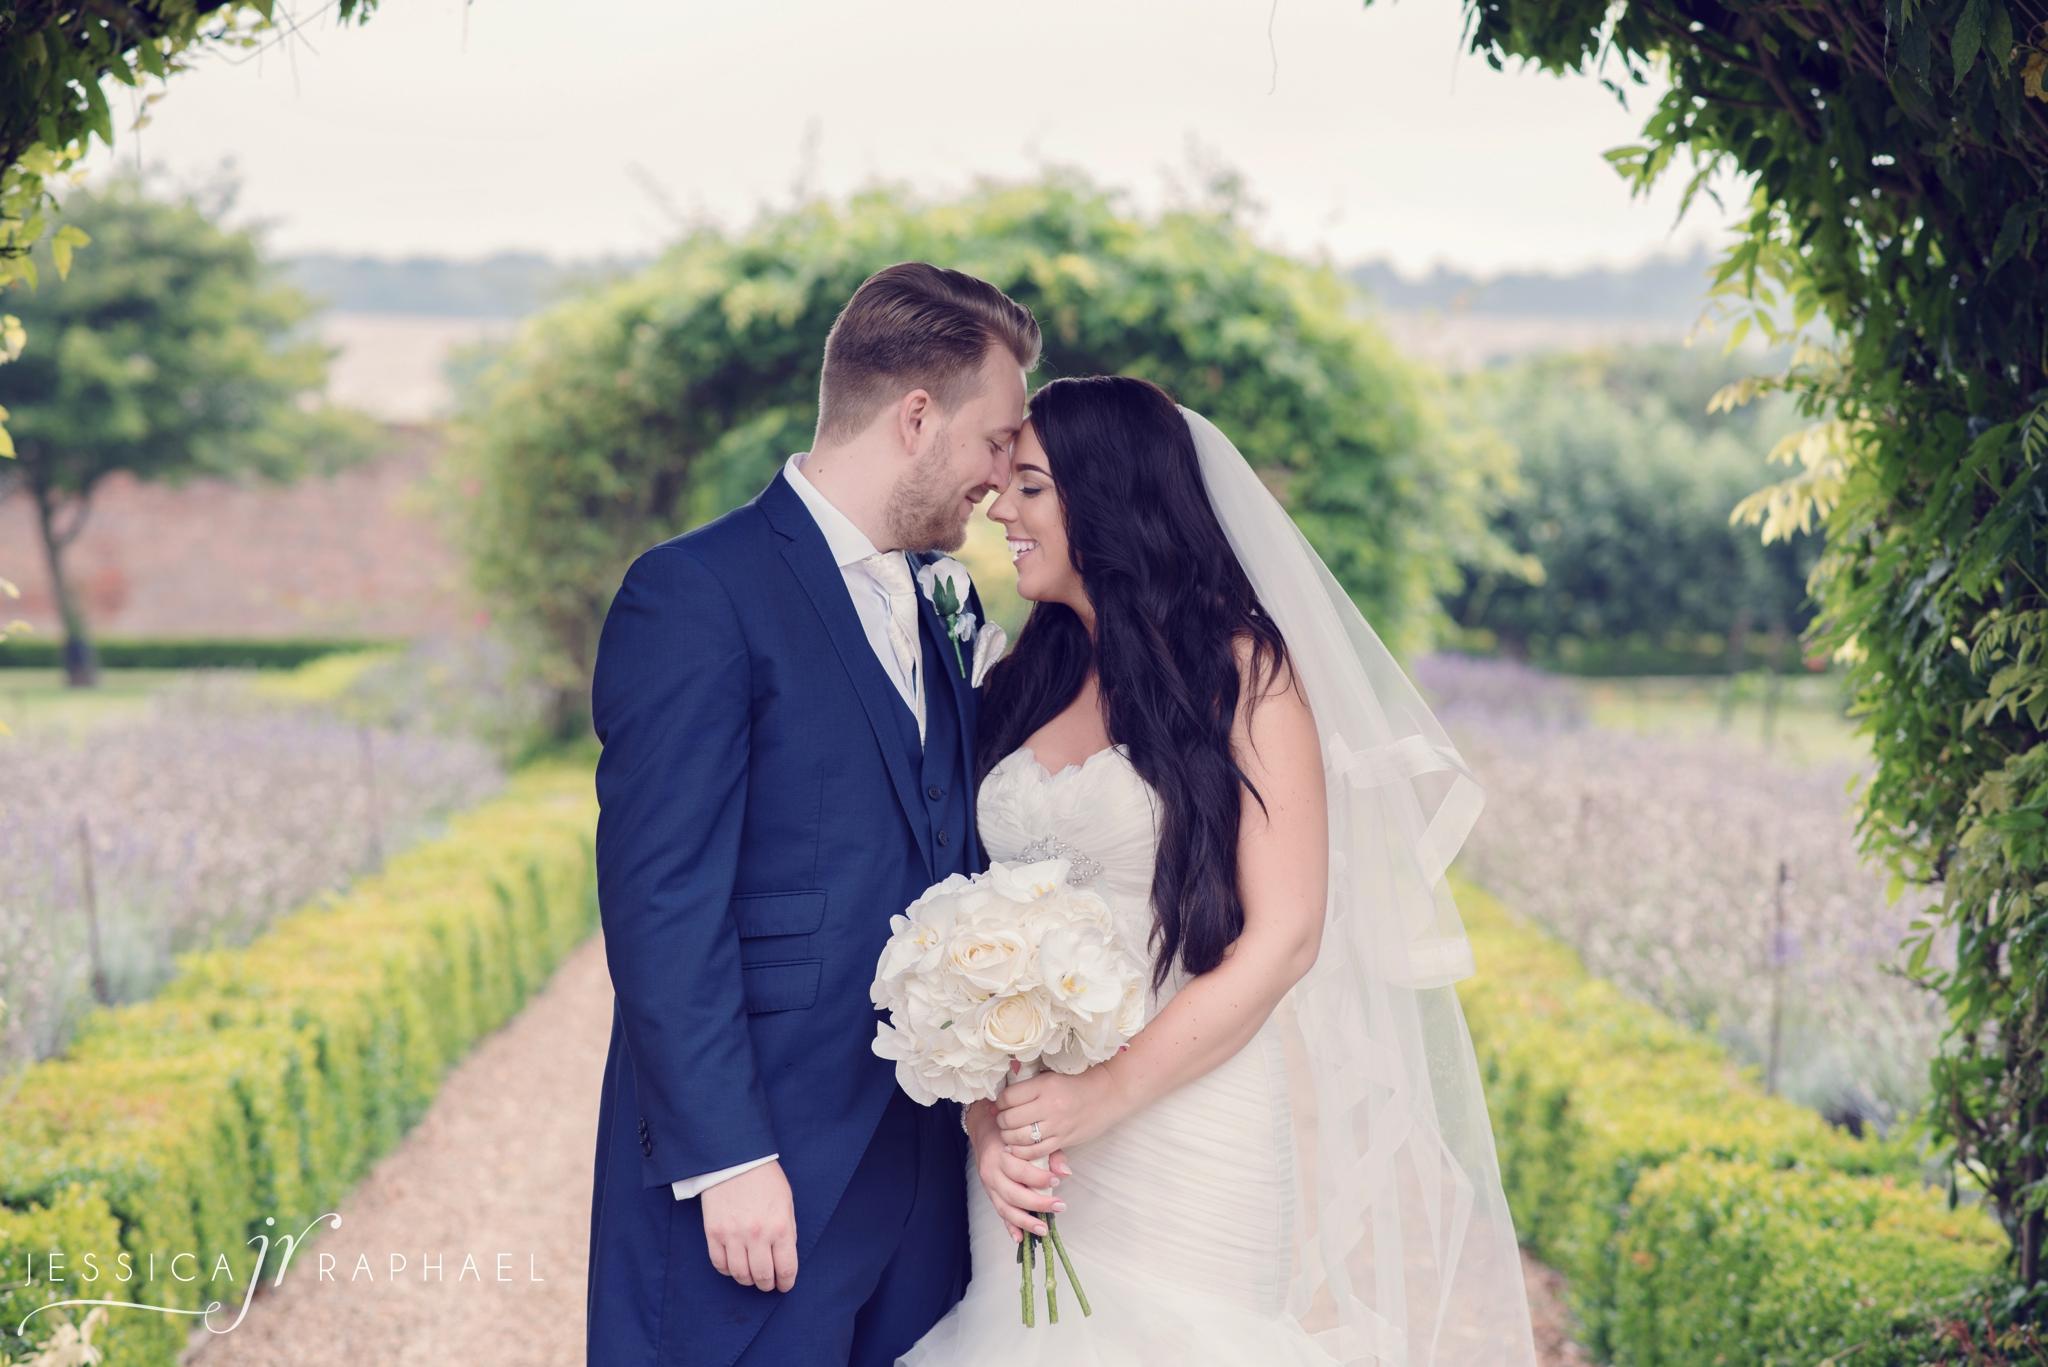 jessica-raphael-photography-uk-wedding-photographer-warwickshire-wedding-photographer-destination-wedding-photographer-jessica-raphael